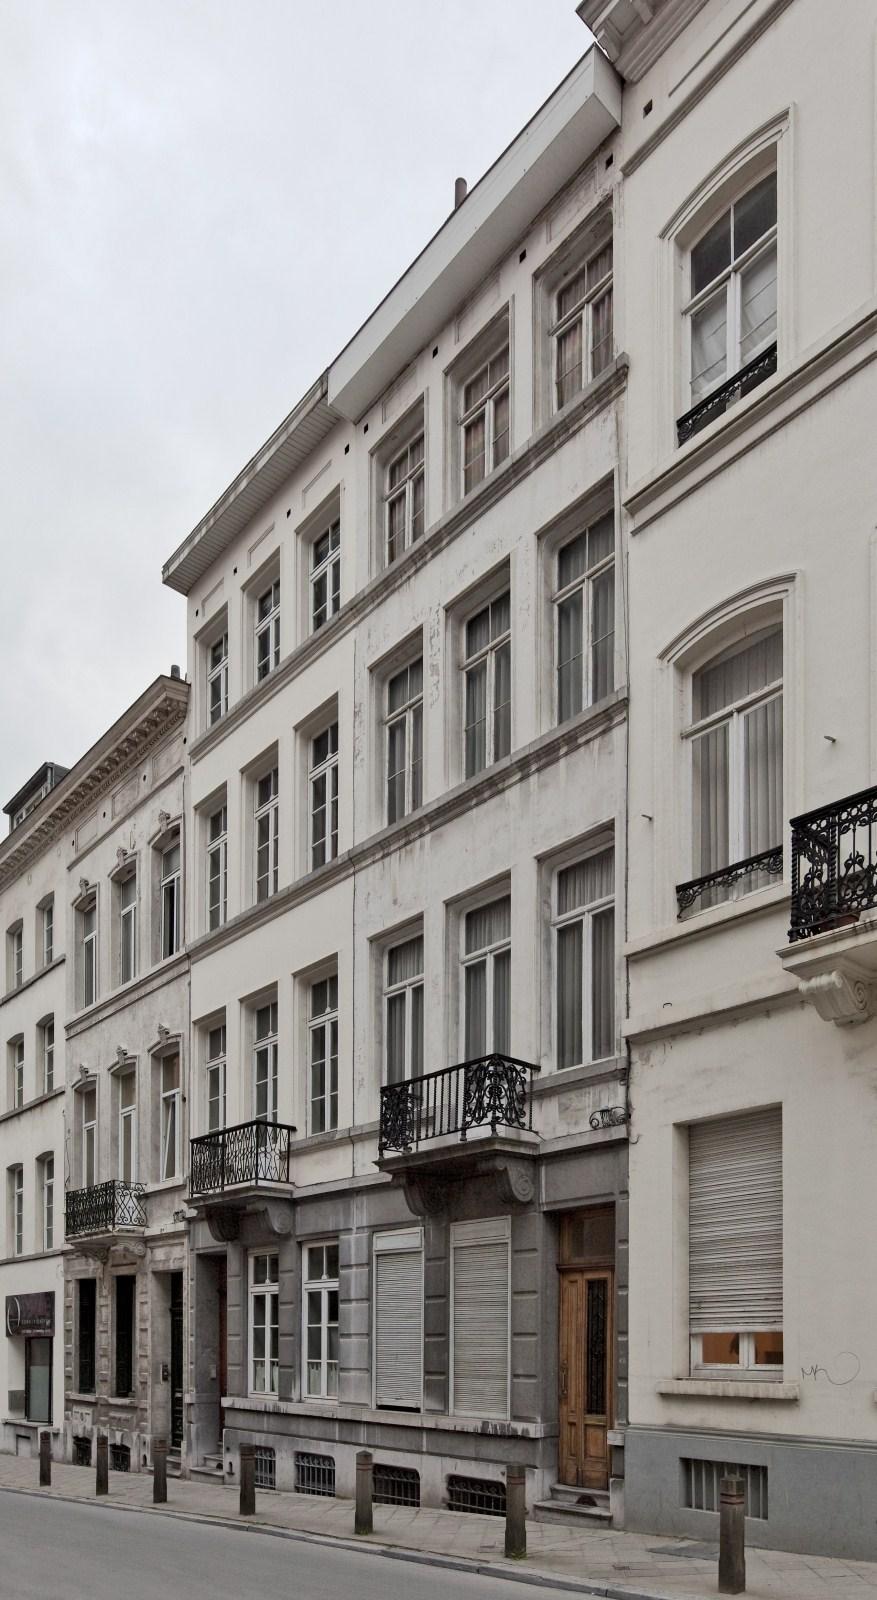 Rue de Stassart 105 et 103.© 2009 © bepictures / BRUNETTA V. – EBERLIN M.